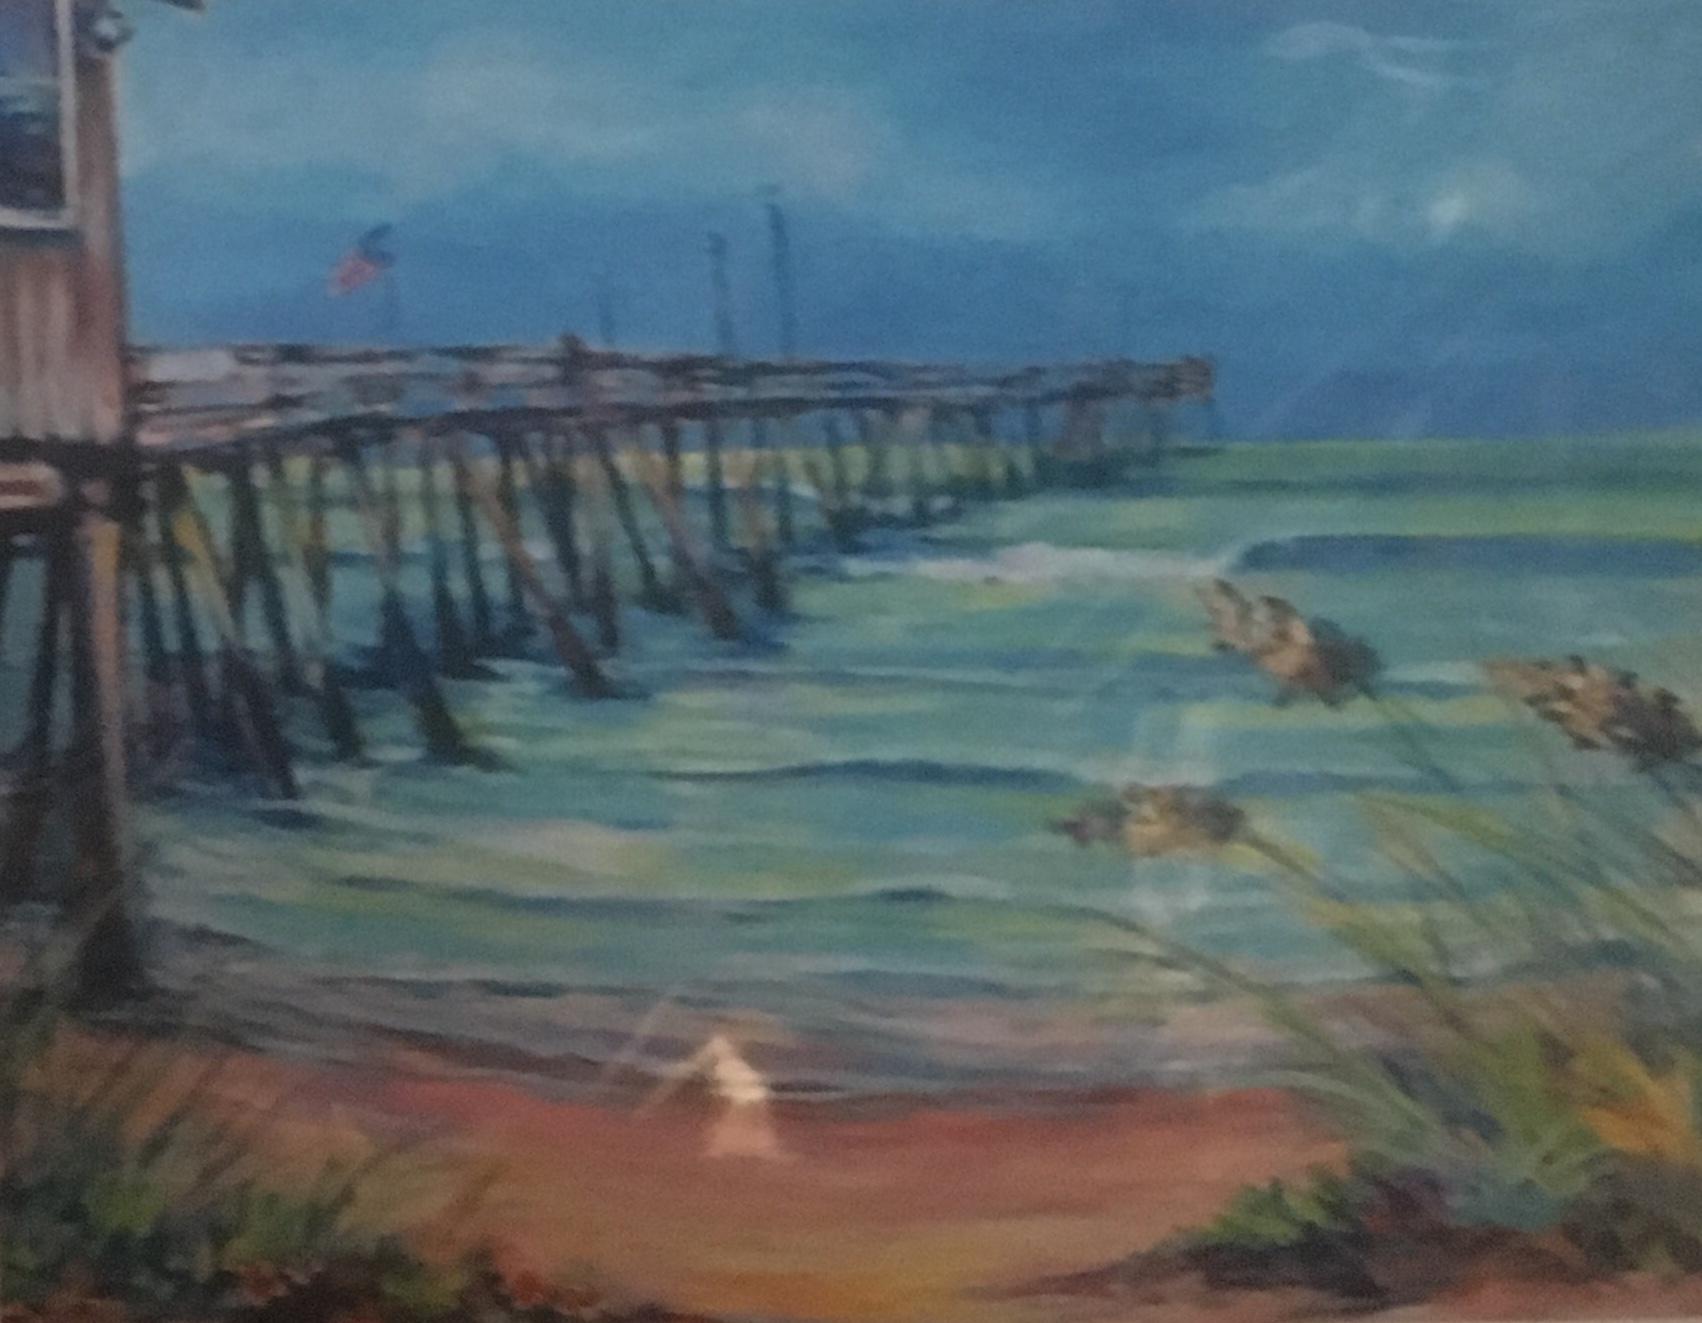 Pier, 11 x 14, Print, $45